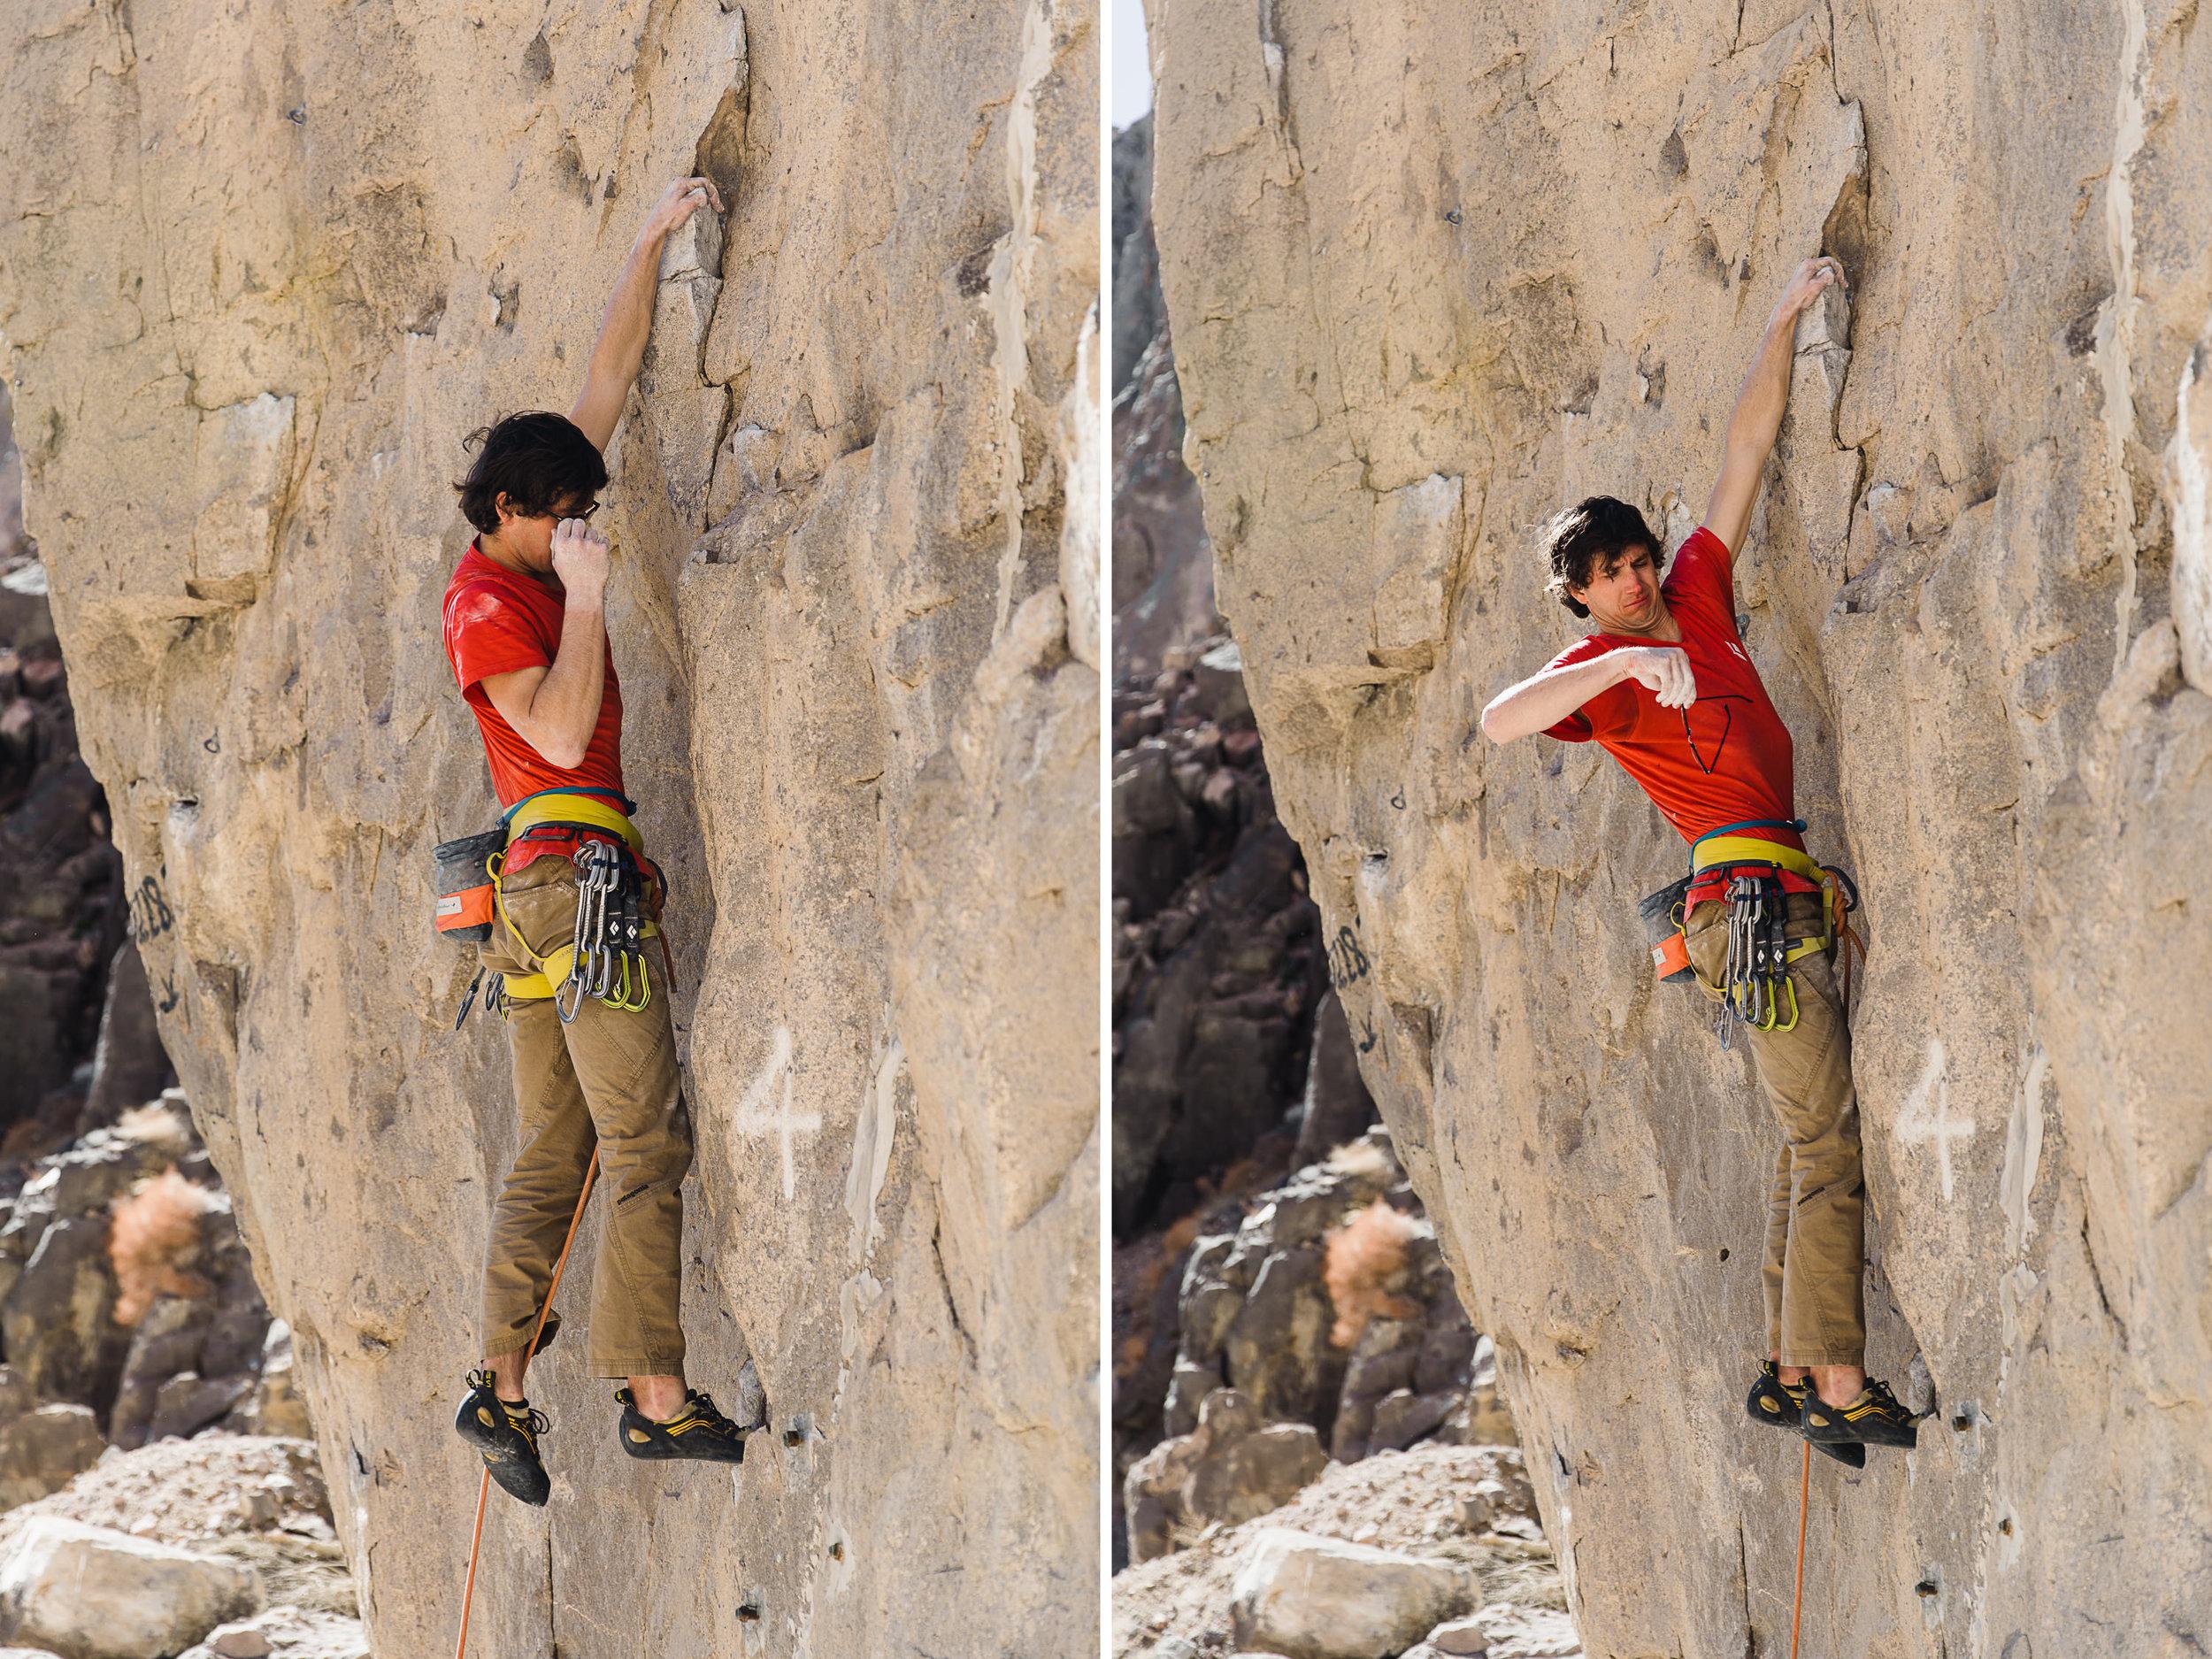 rock-climbing-photography-13.jpg